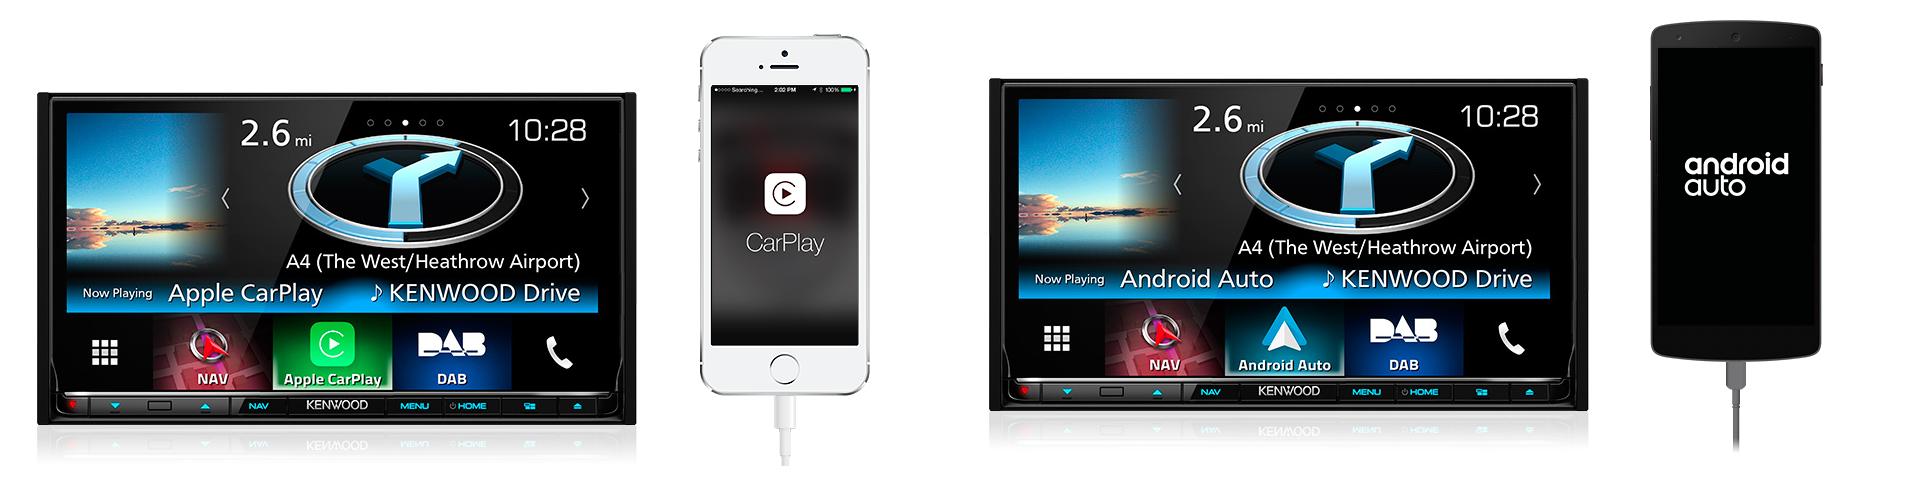 kenwood dmx7017dabs android auto apple carplay bluetooth. Black Bedroom Furniture Sets. Home Design Ideas